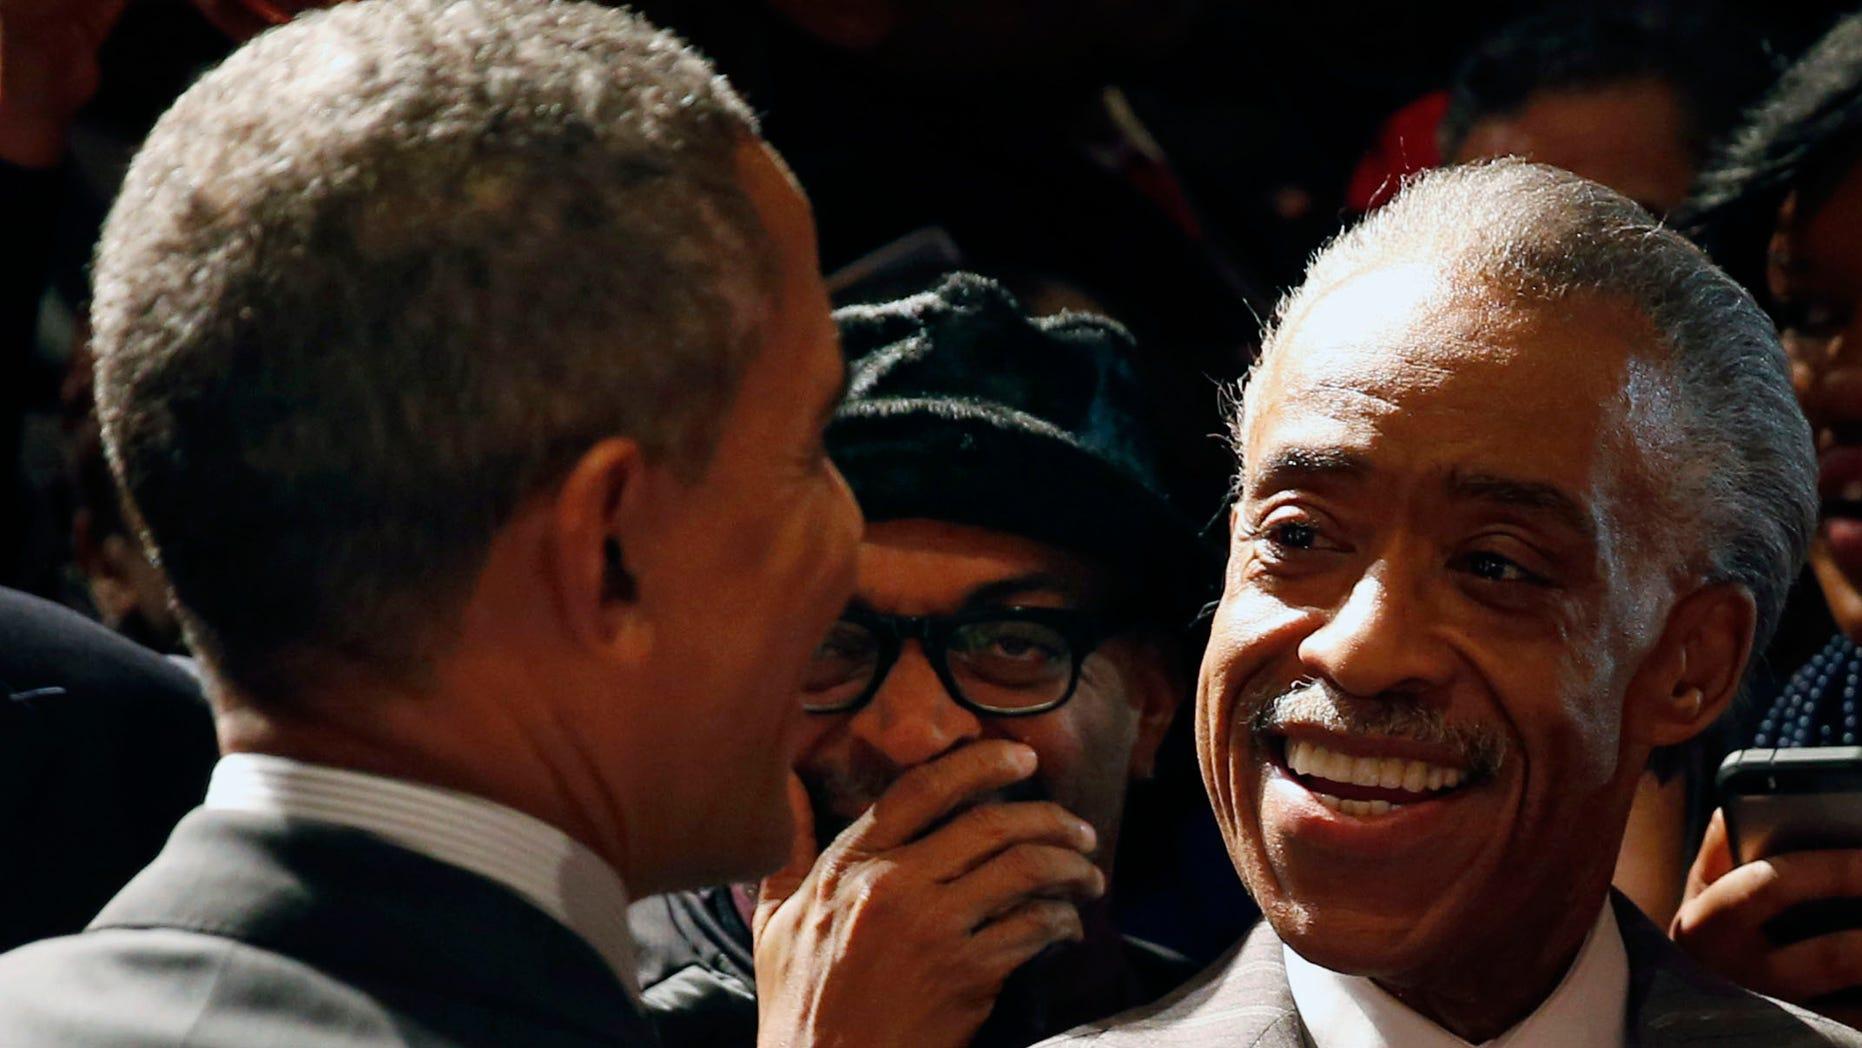 April 11, 2014: U.S. President Obama laughs with film director Spike Lee (C) and Reverend Al Sharpton (R).